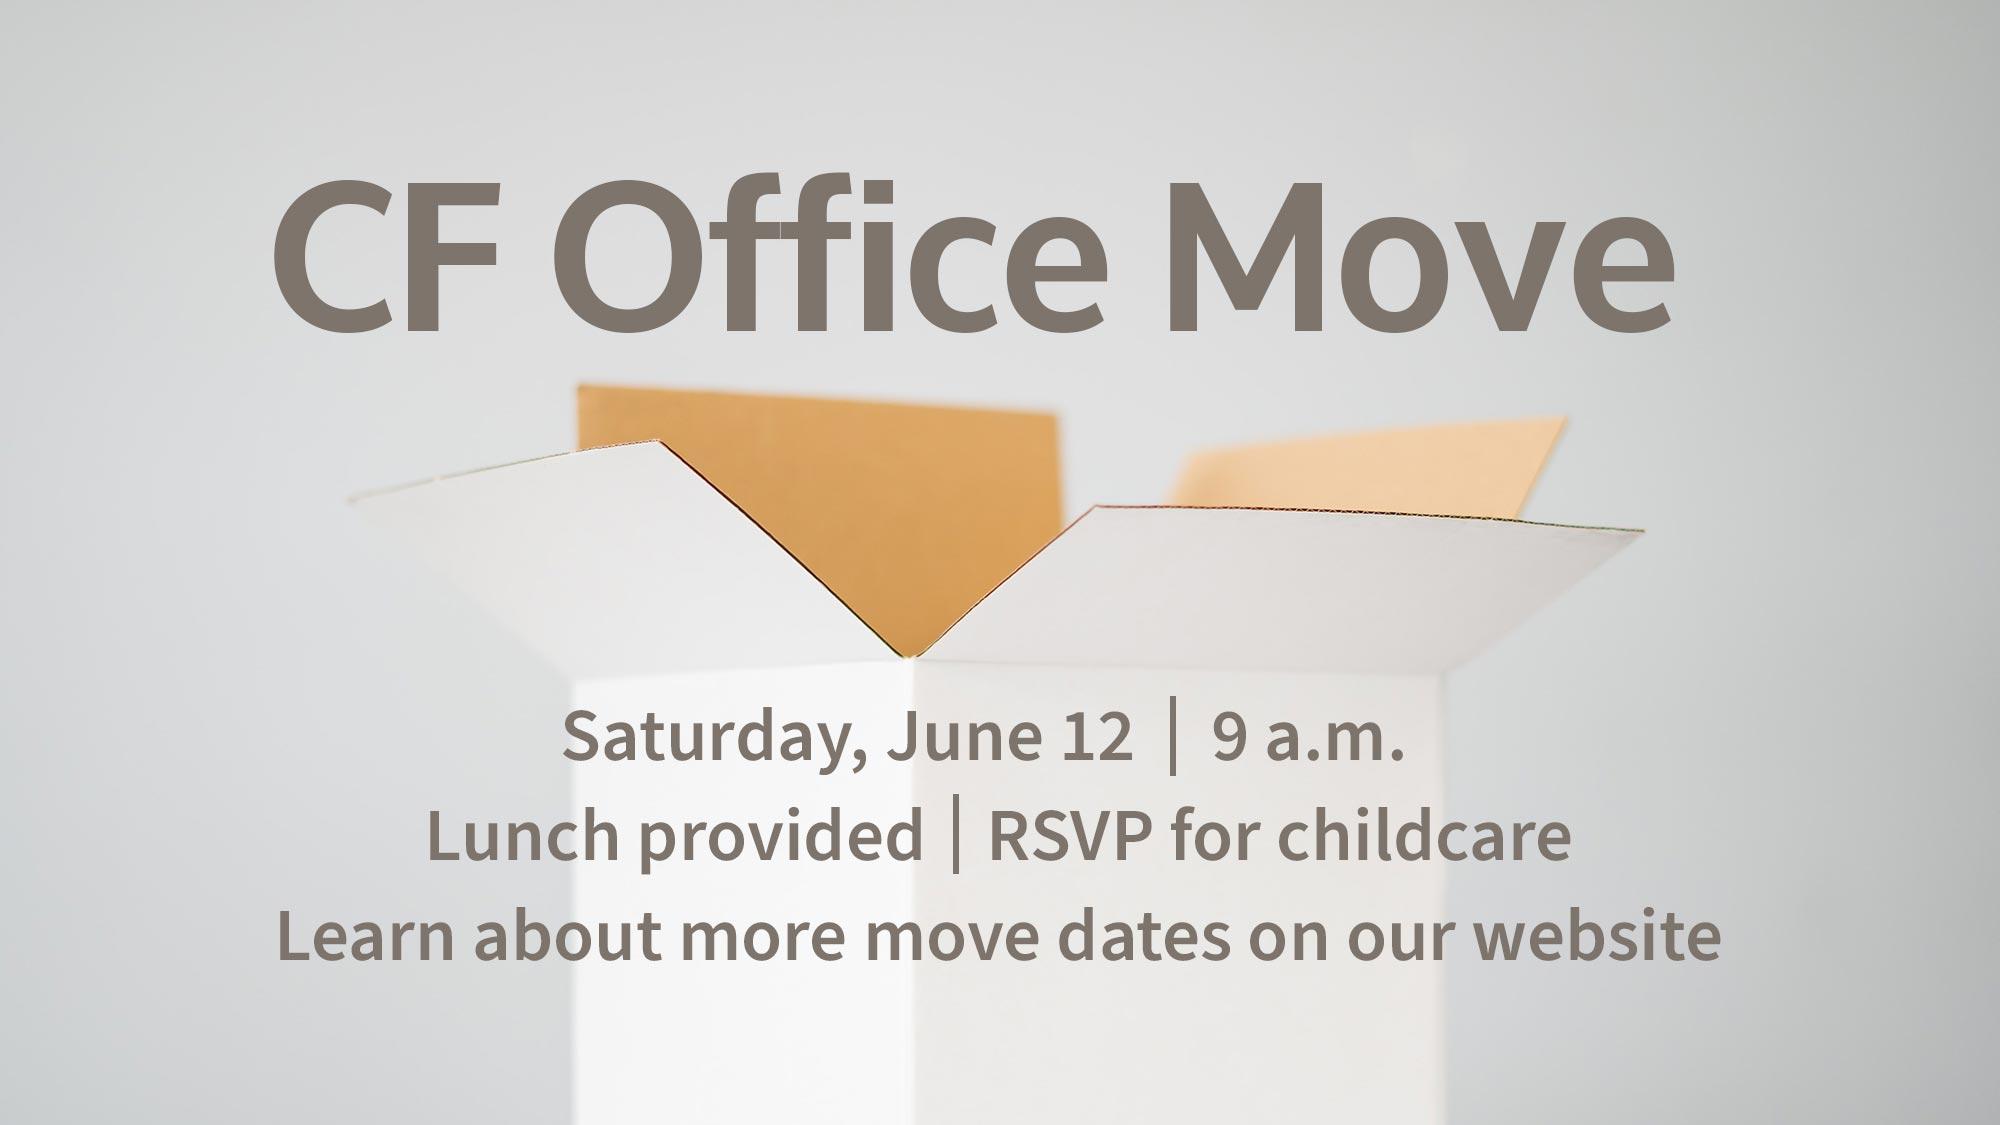 move-office-CF